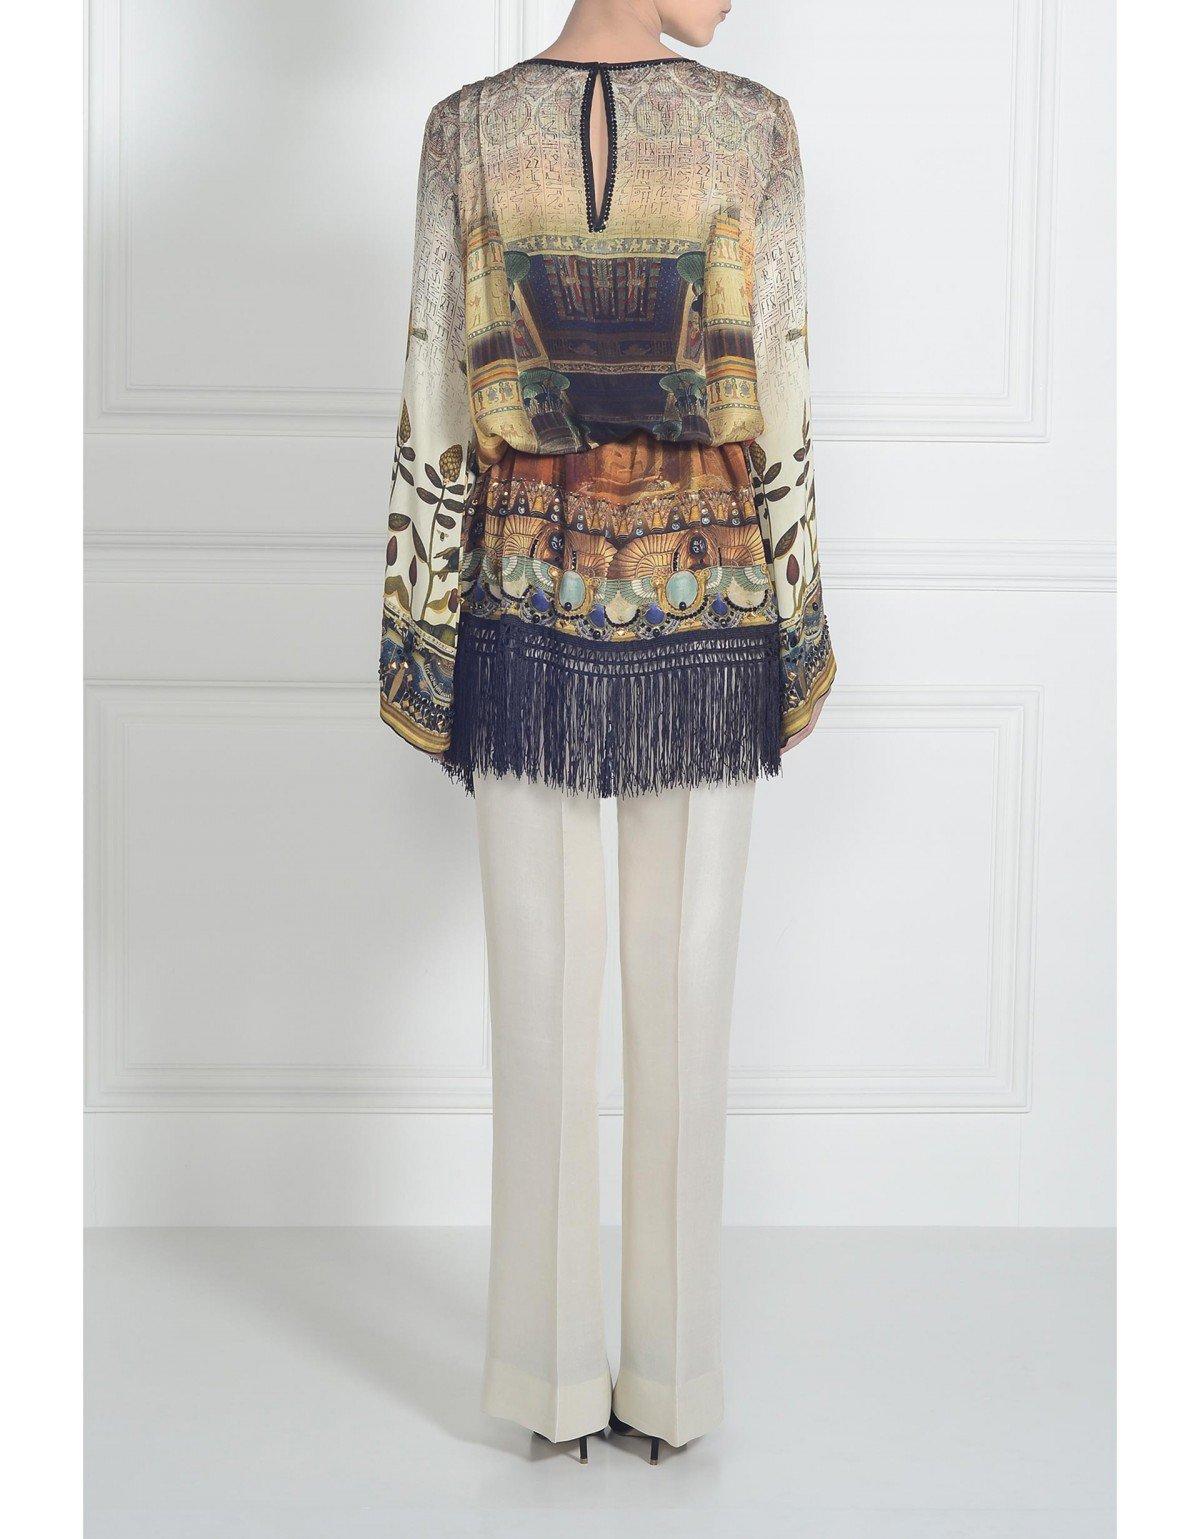 Elan pure Digital Silk prints Fashion Dressess Kurties Top and pants 2015-2016 (5)